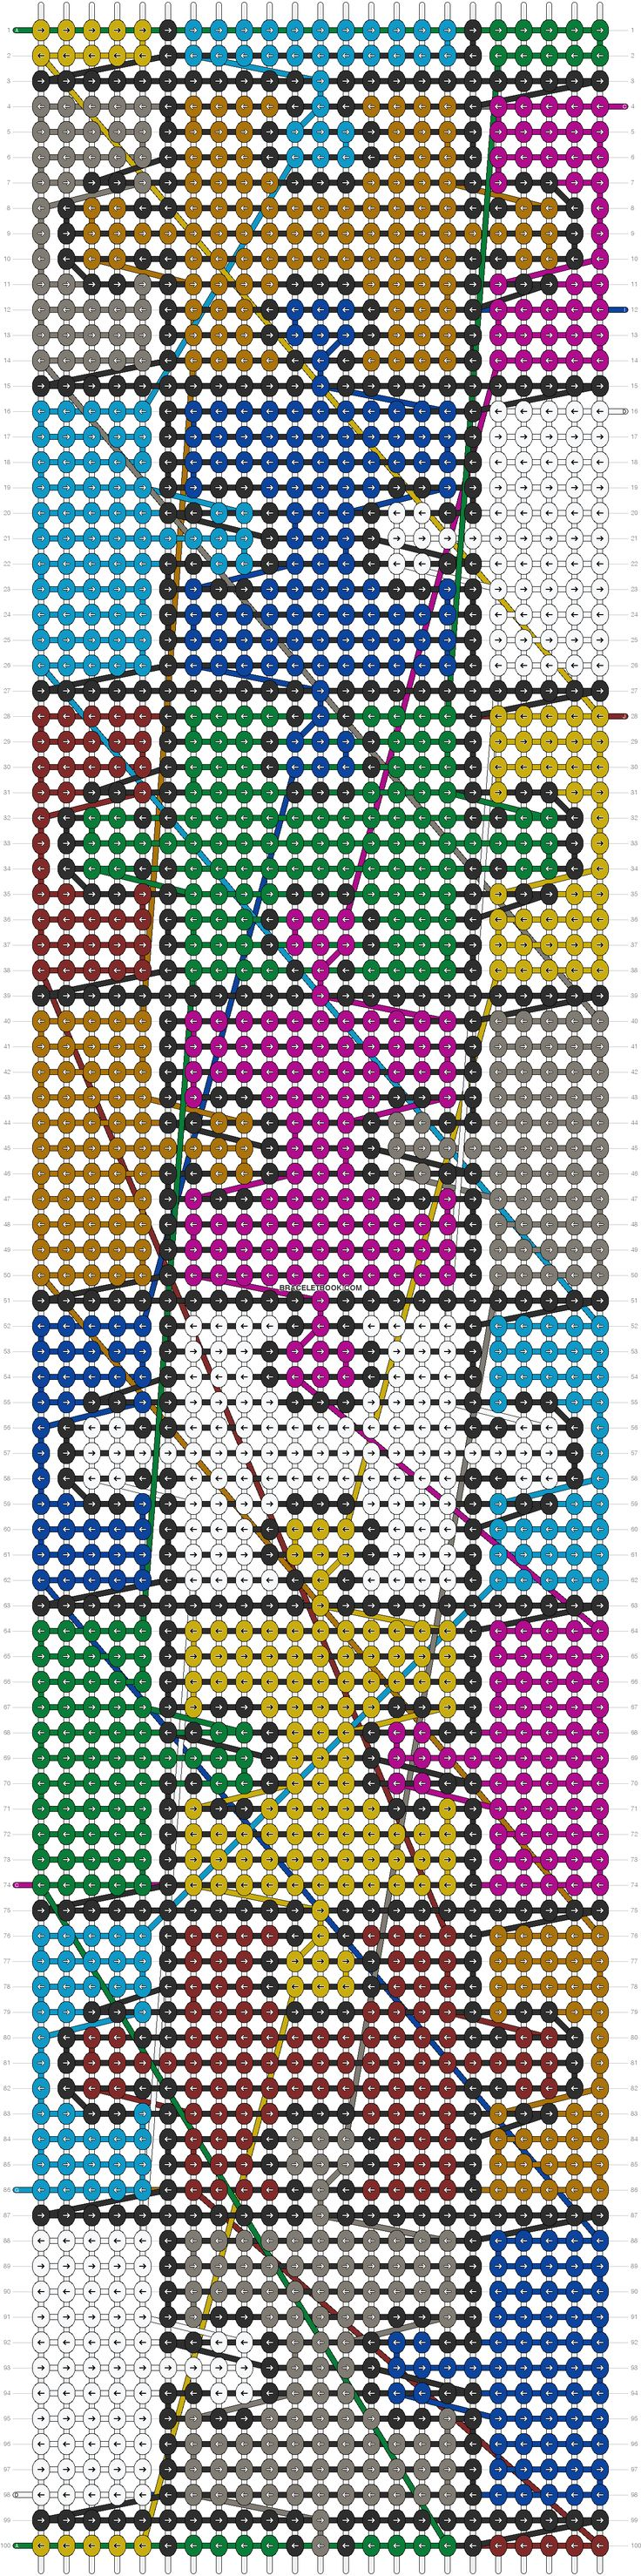 Alpha Pattern #9513 added by Meriska